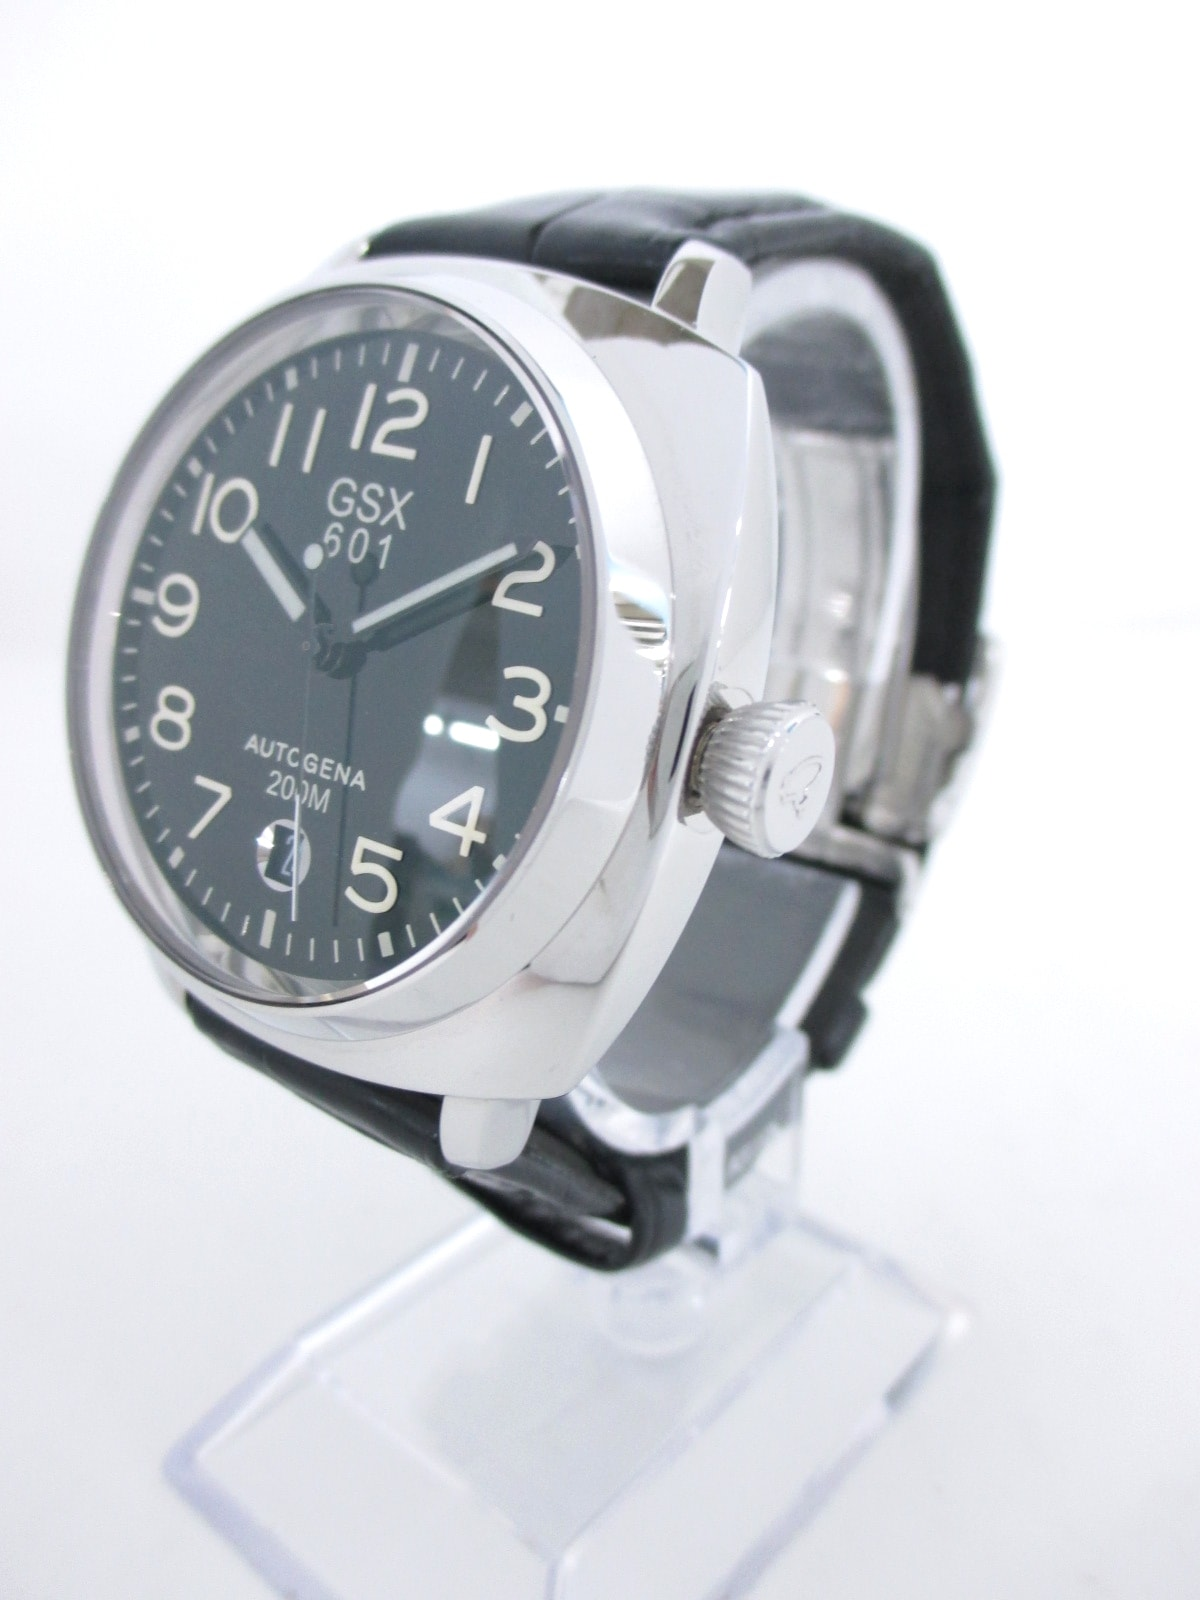 GSX WATCH(ジーエスエックス)のGSX601